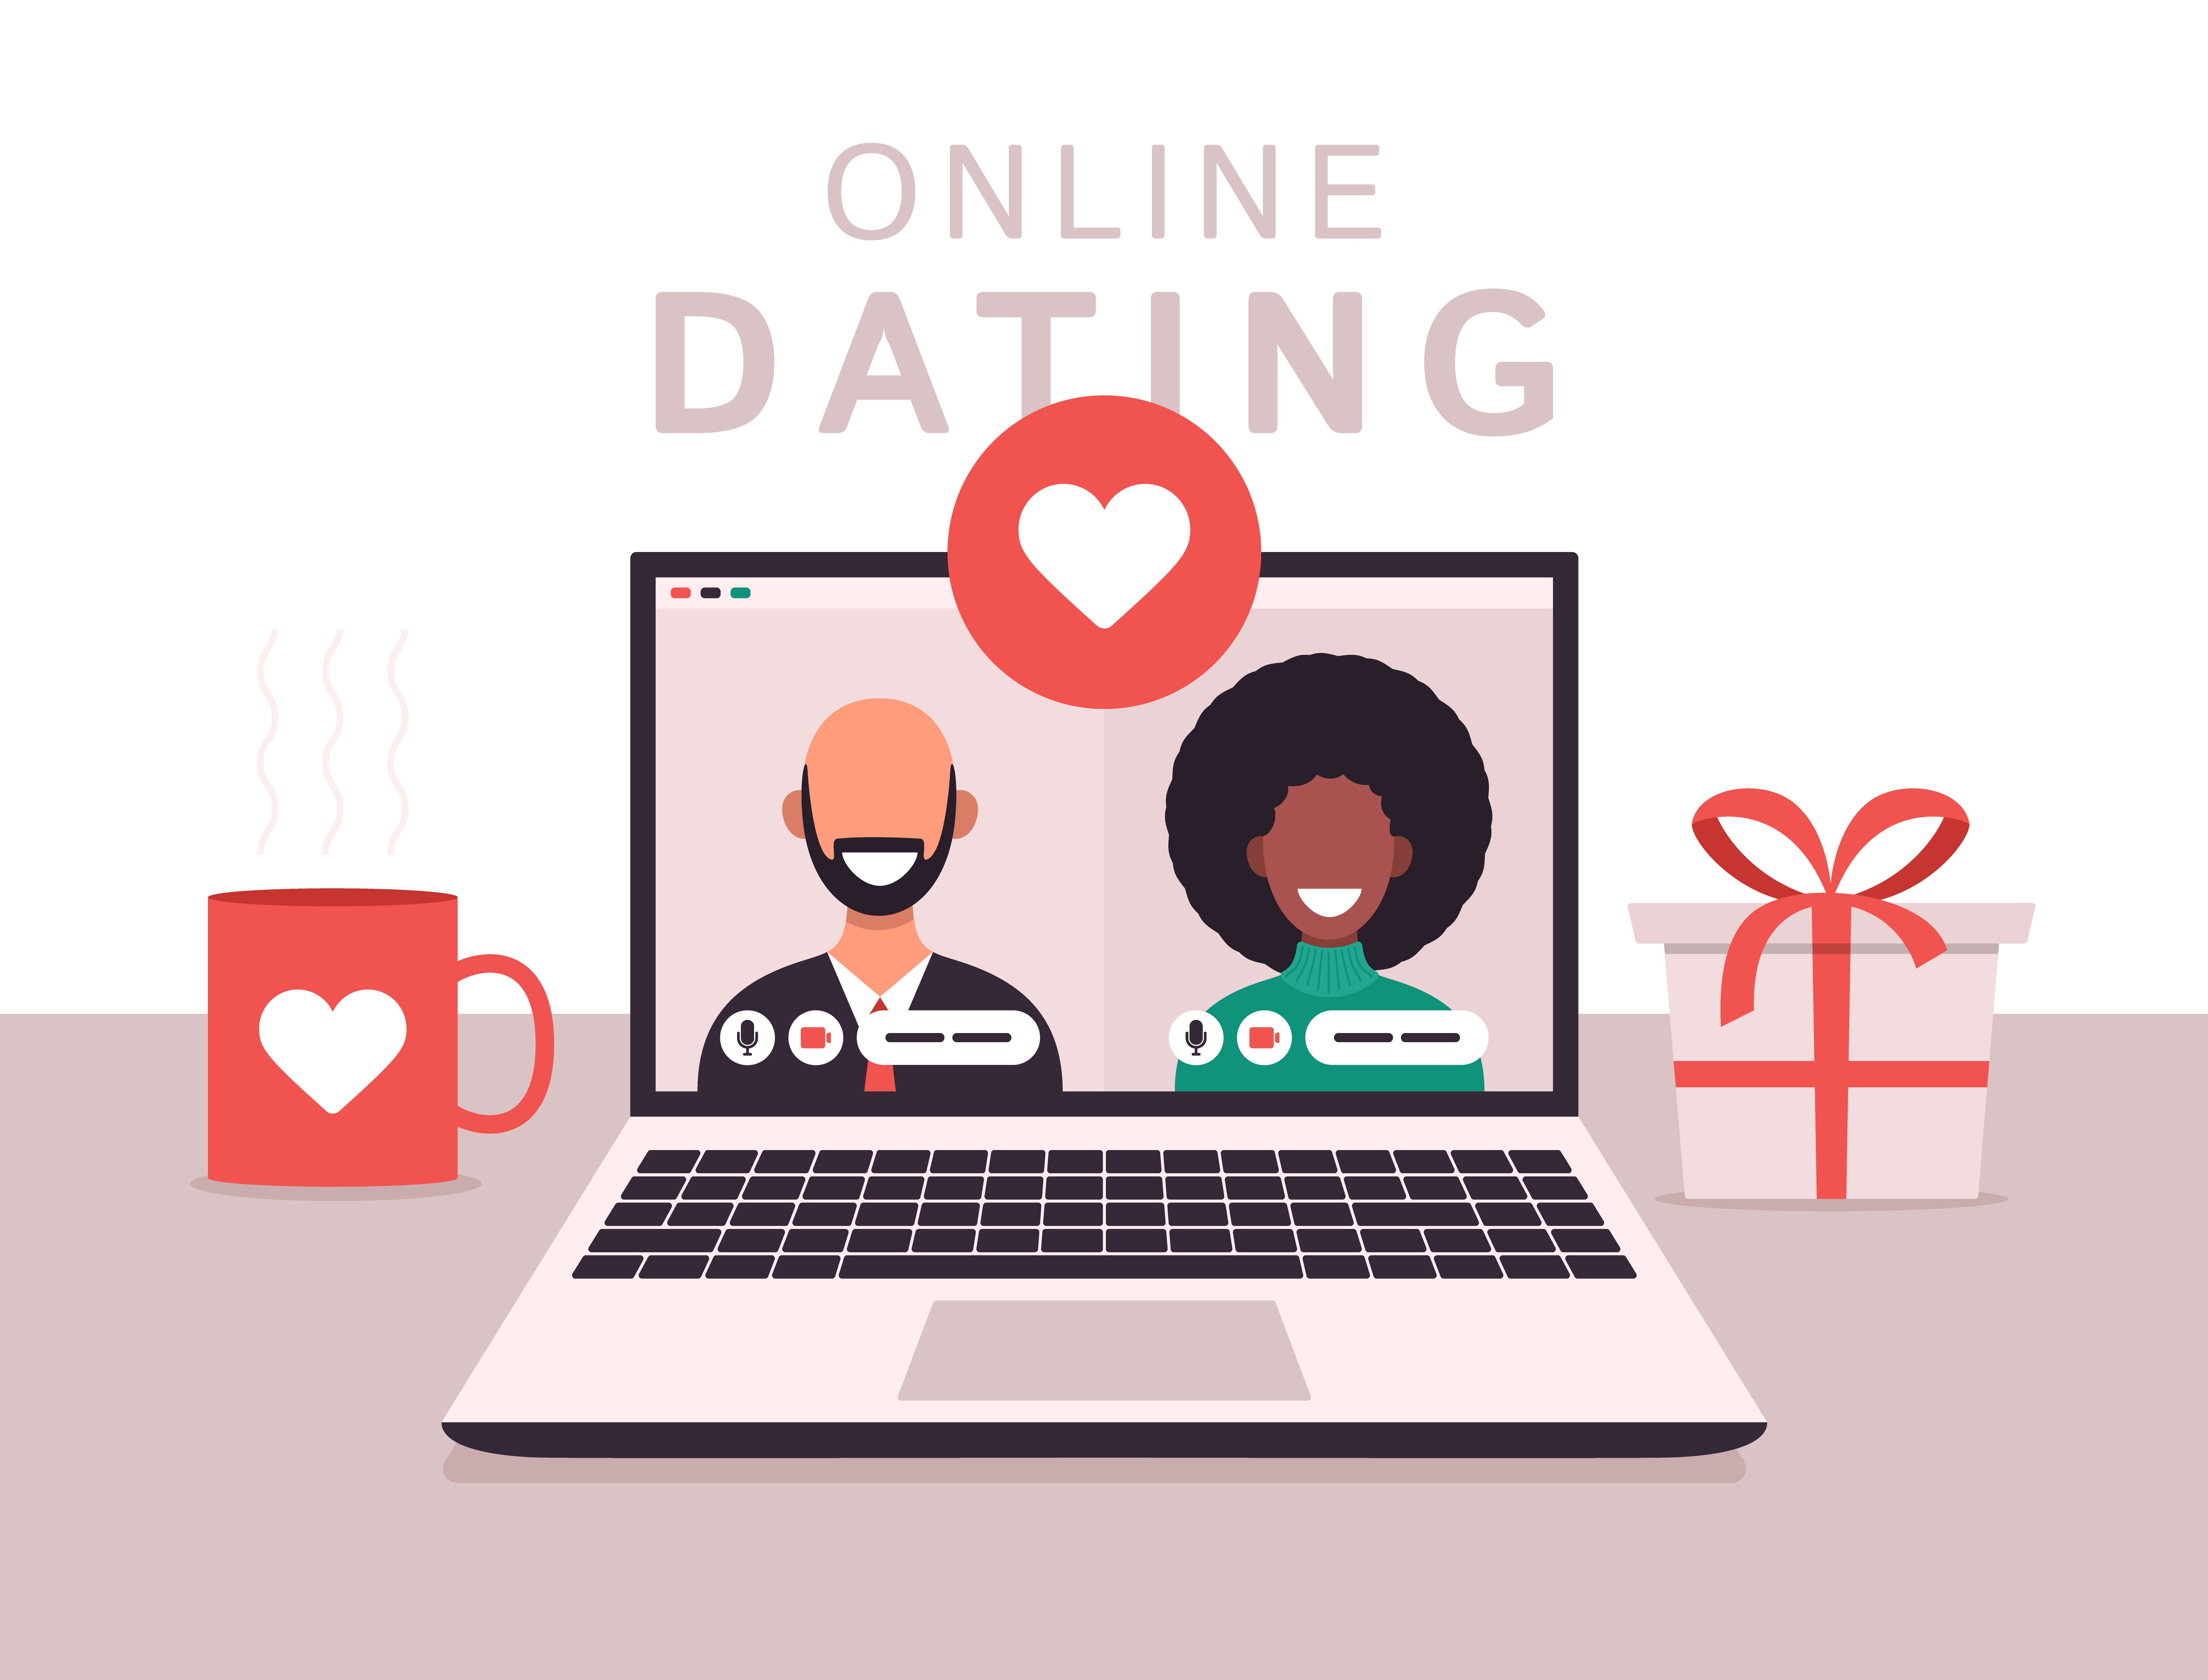 bald online dating